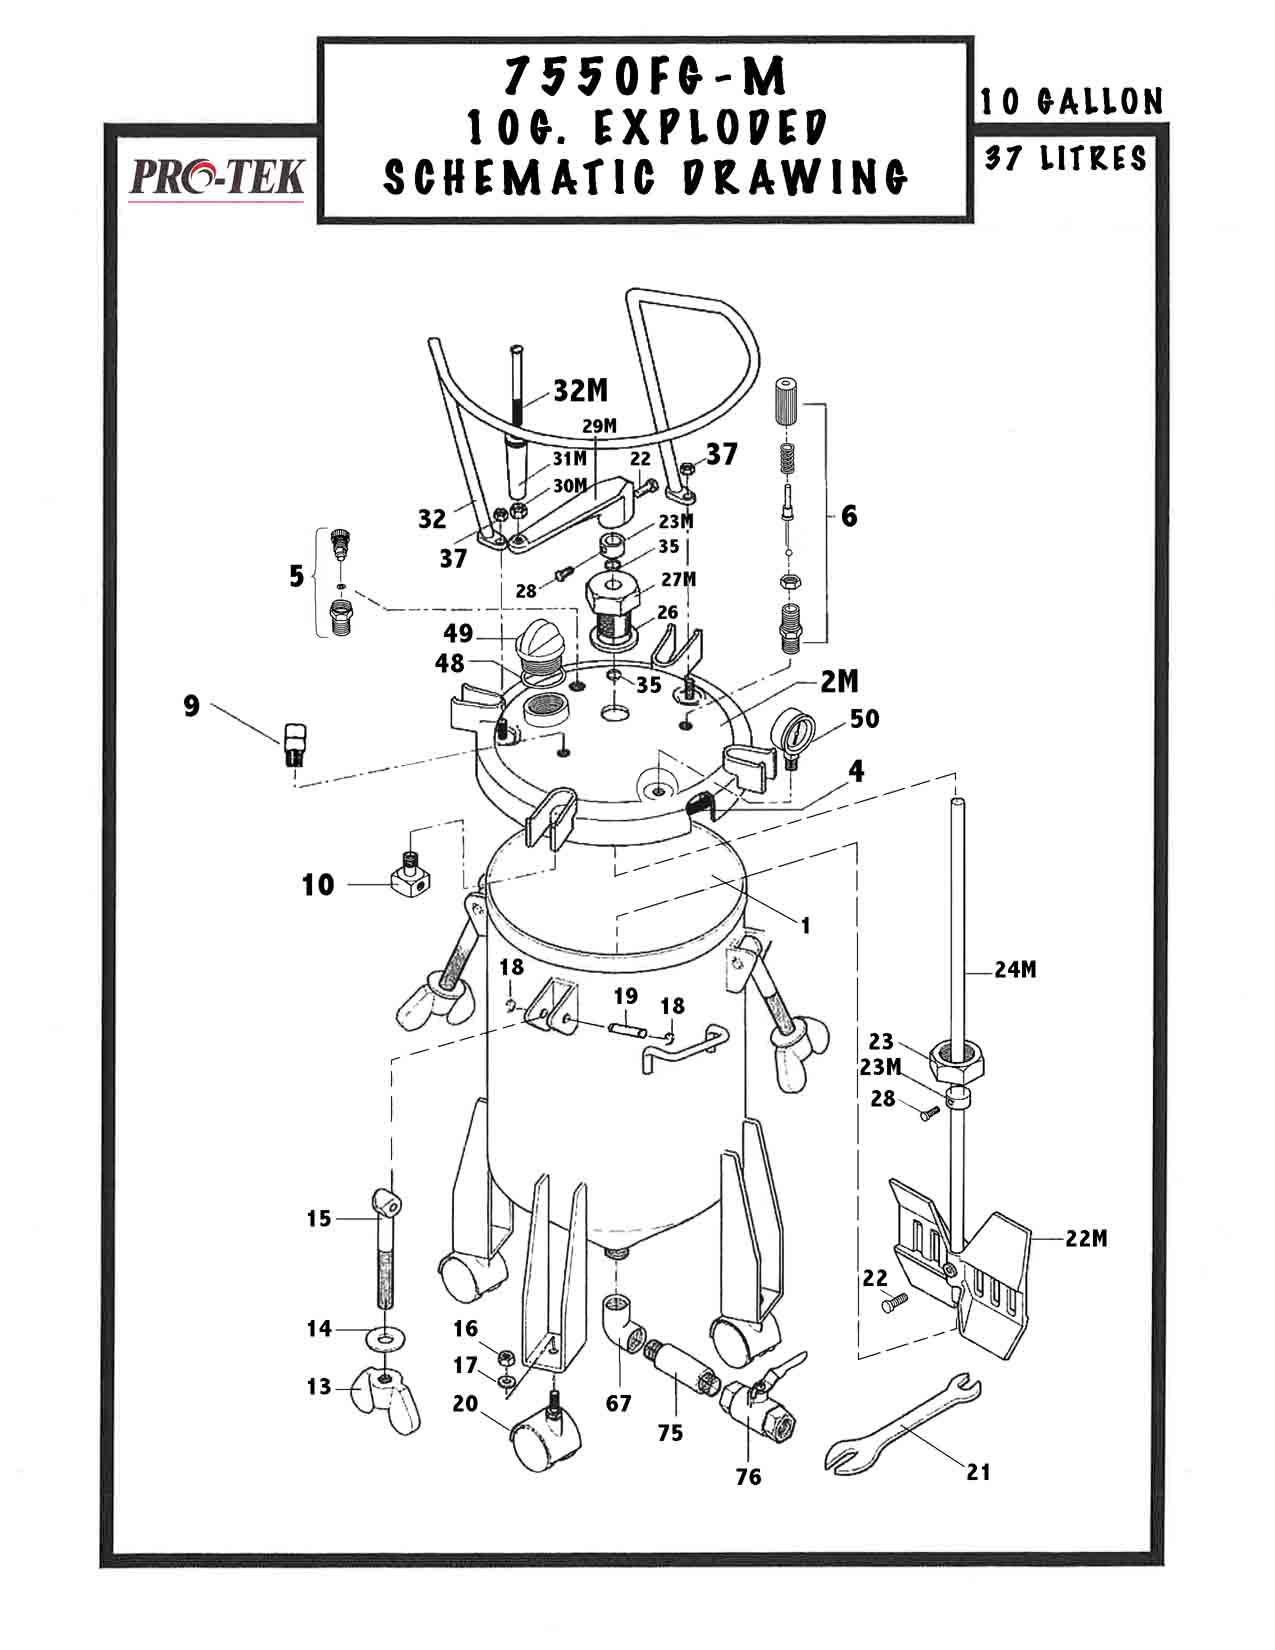 Https Post California Manual Of Style Under Hood Fuse Box Diagram 300x264 2000 Mustang V6 7550fg M Bd